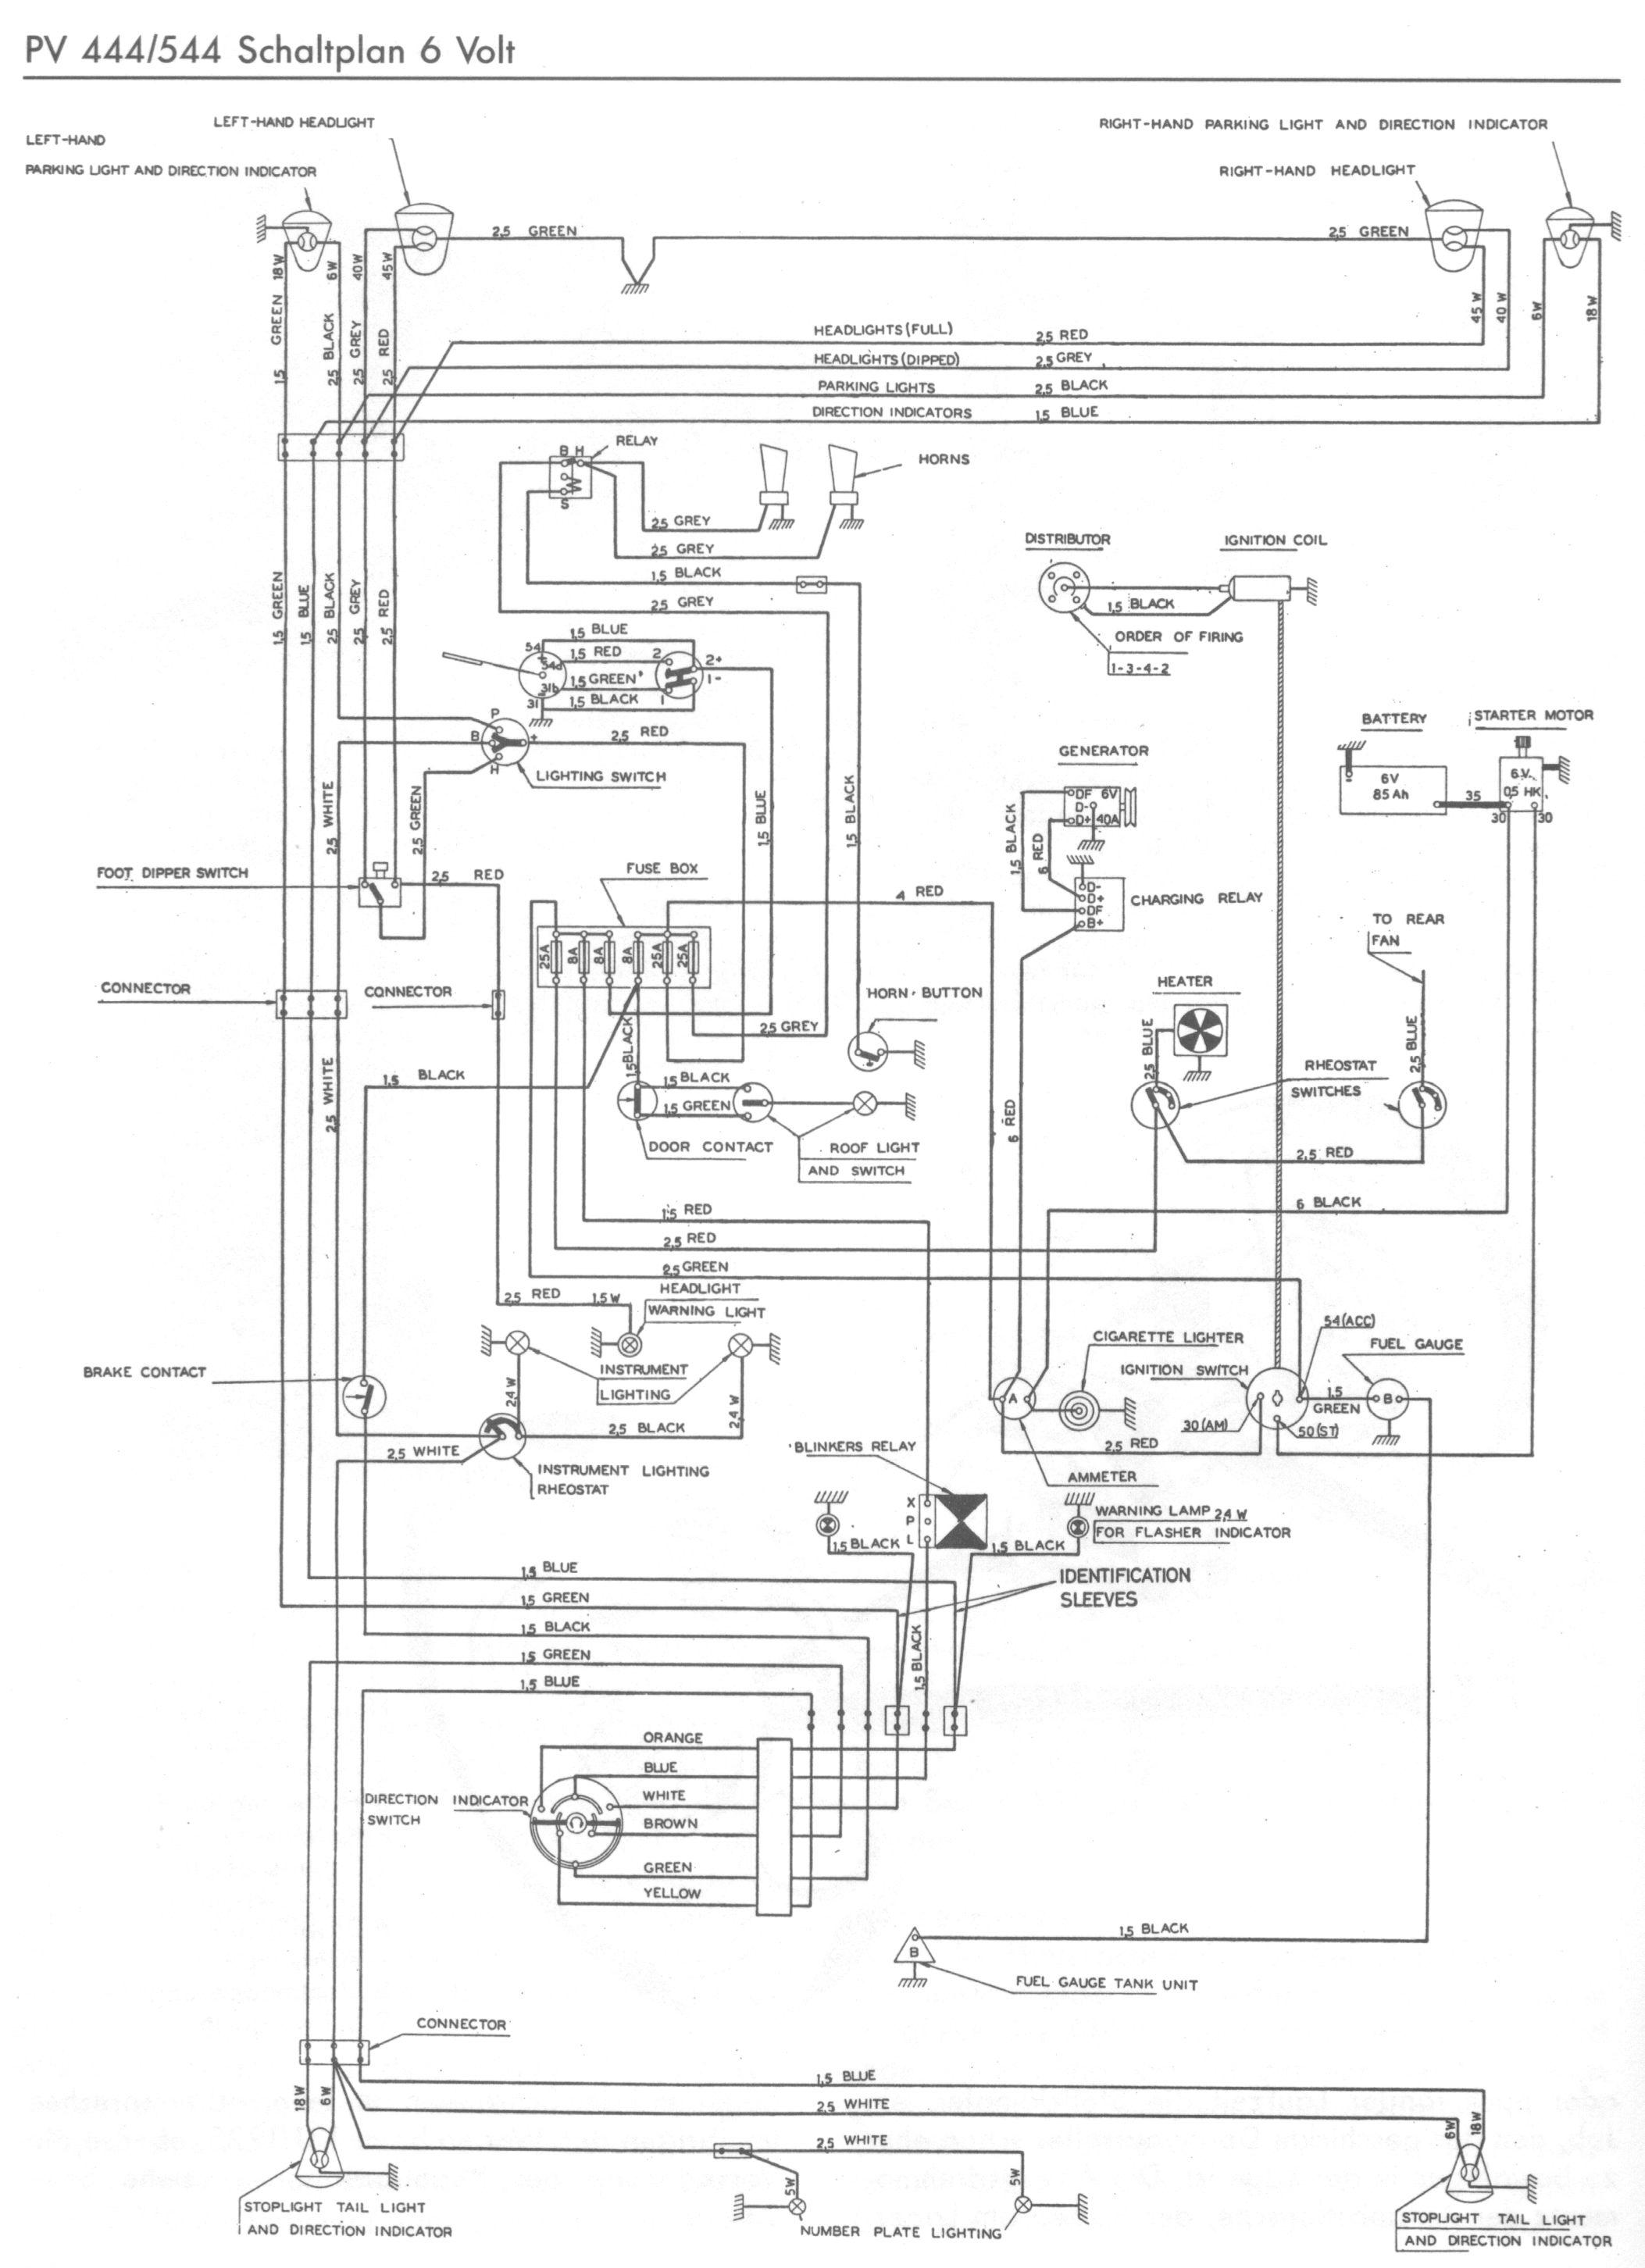 Schaltplane Networksvolvoniacs